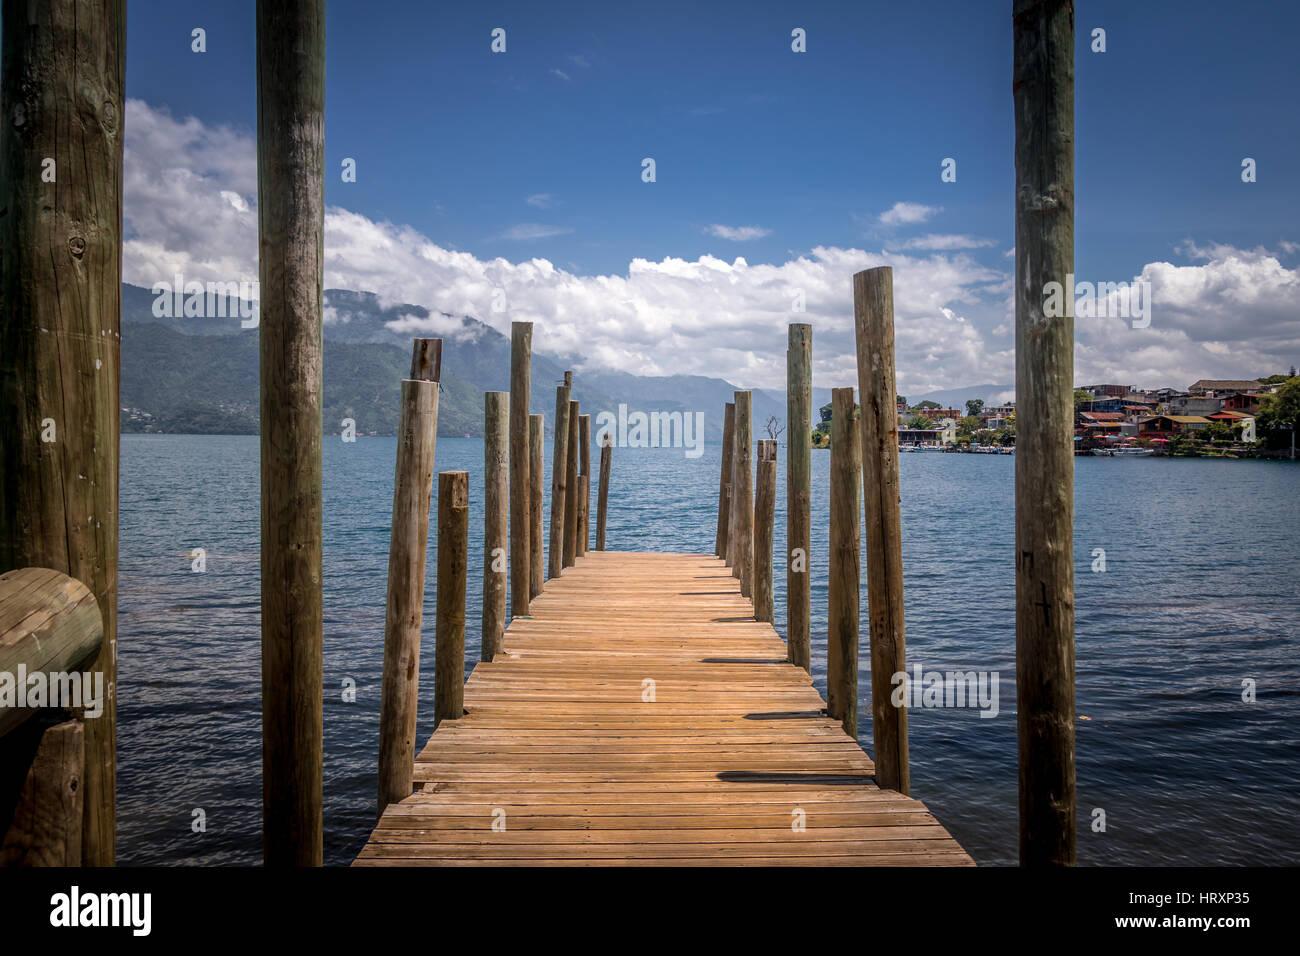 Small wooden pier at Atitlan Lake - San Pedro la Laguna, Guatemala - Stock Image